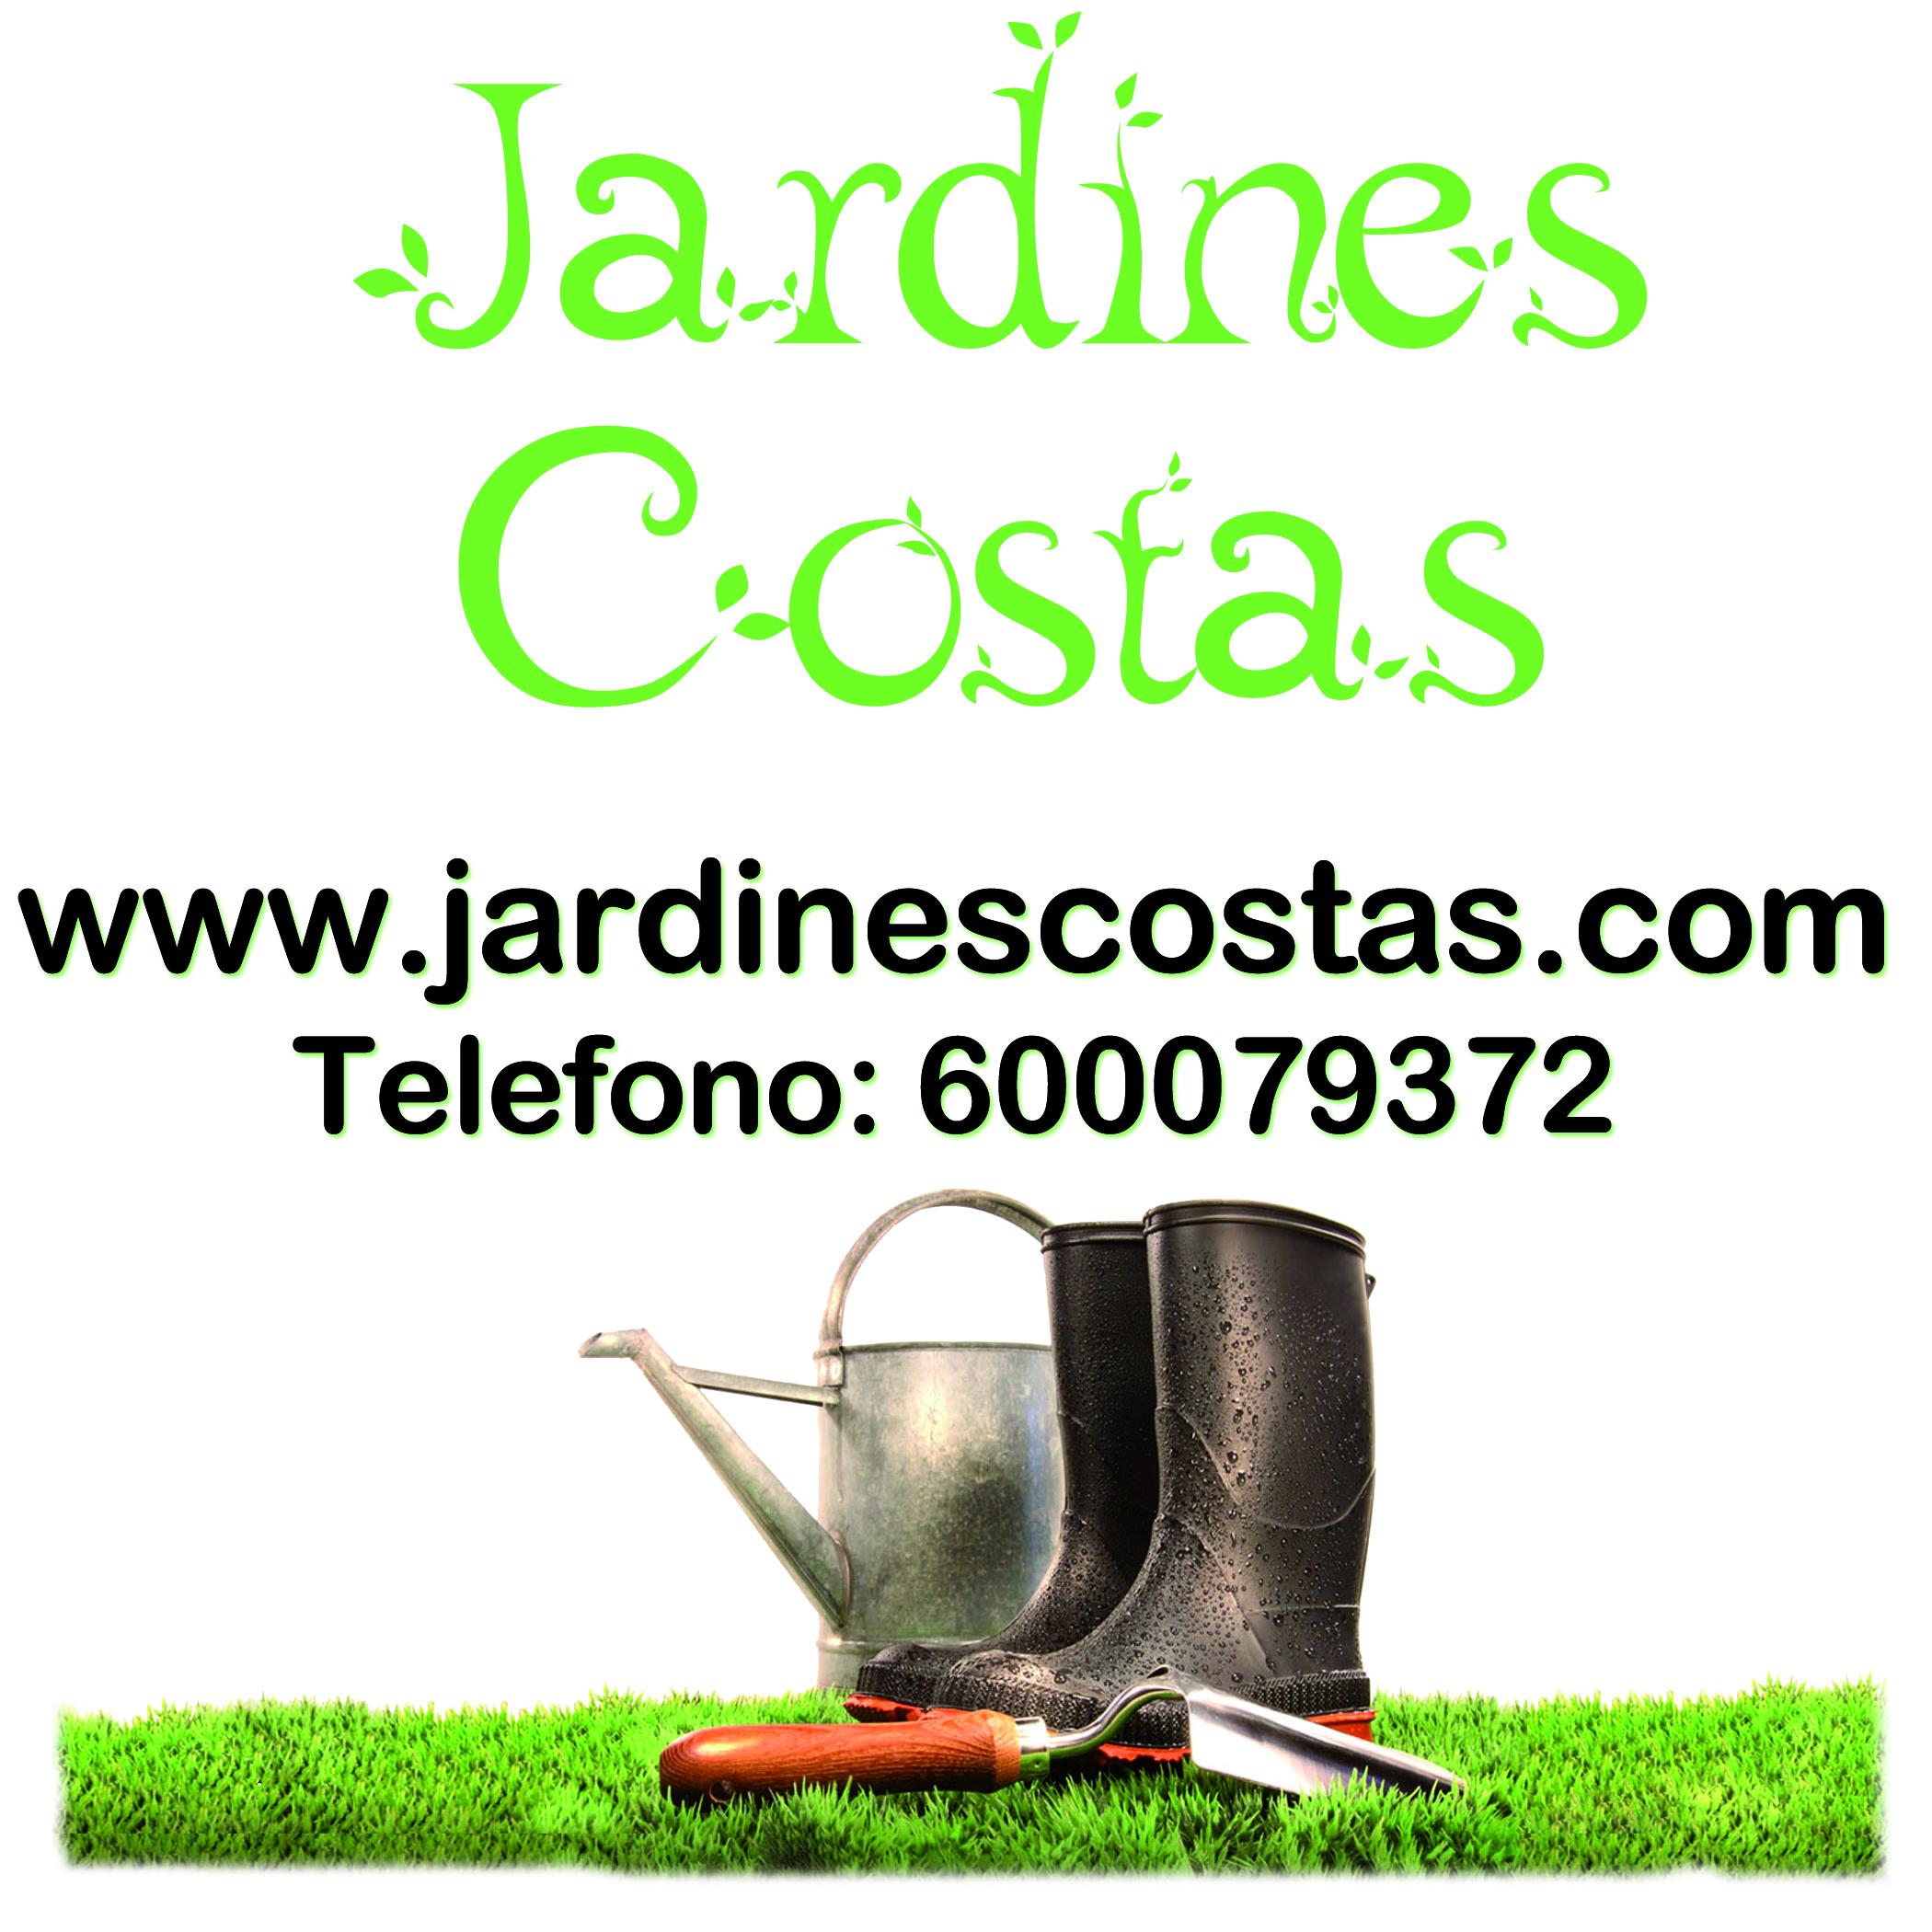 Jardines Costas